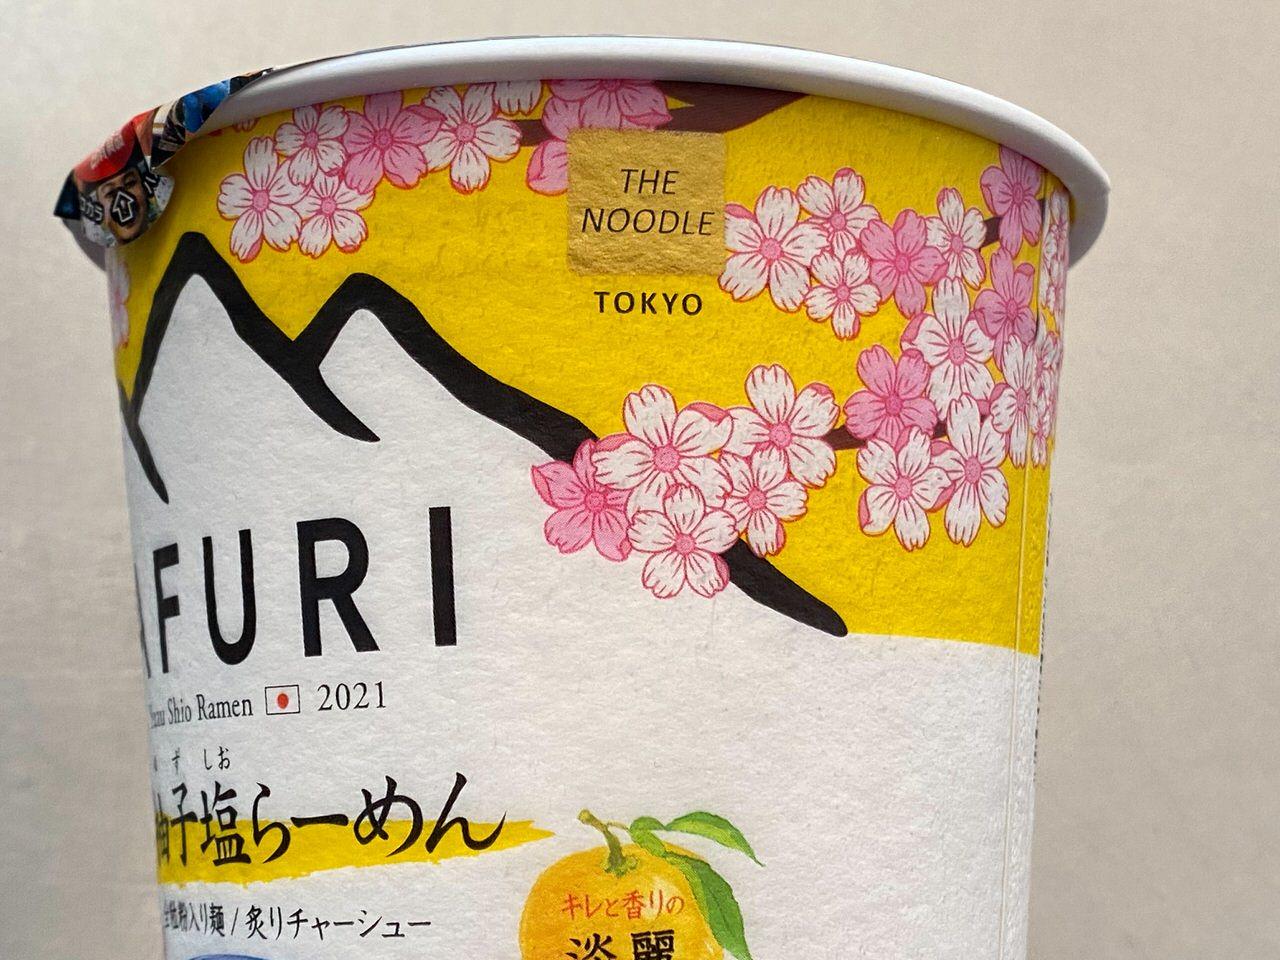 AFURI 春限定 柚子塩らーめん 淡麗(2021) 002 202103